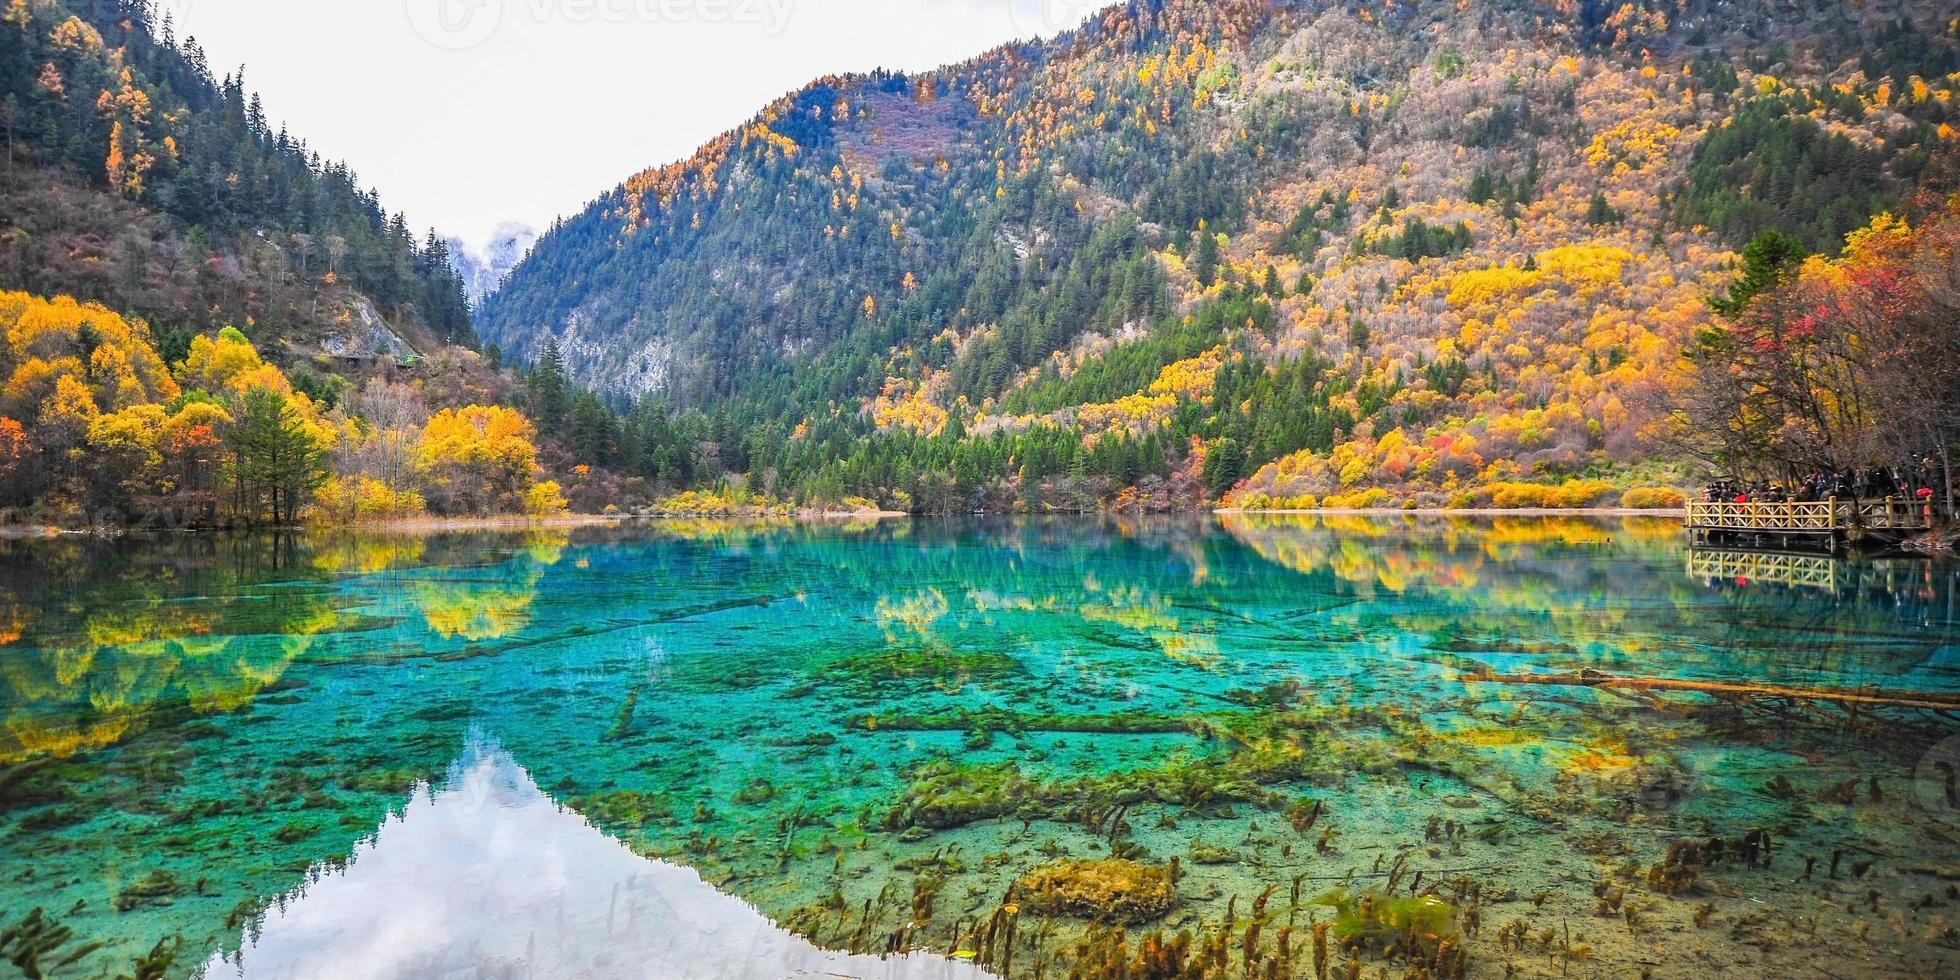 parc national de jiuzhaigou photo